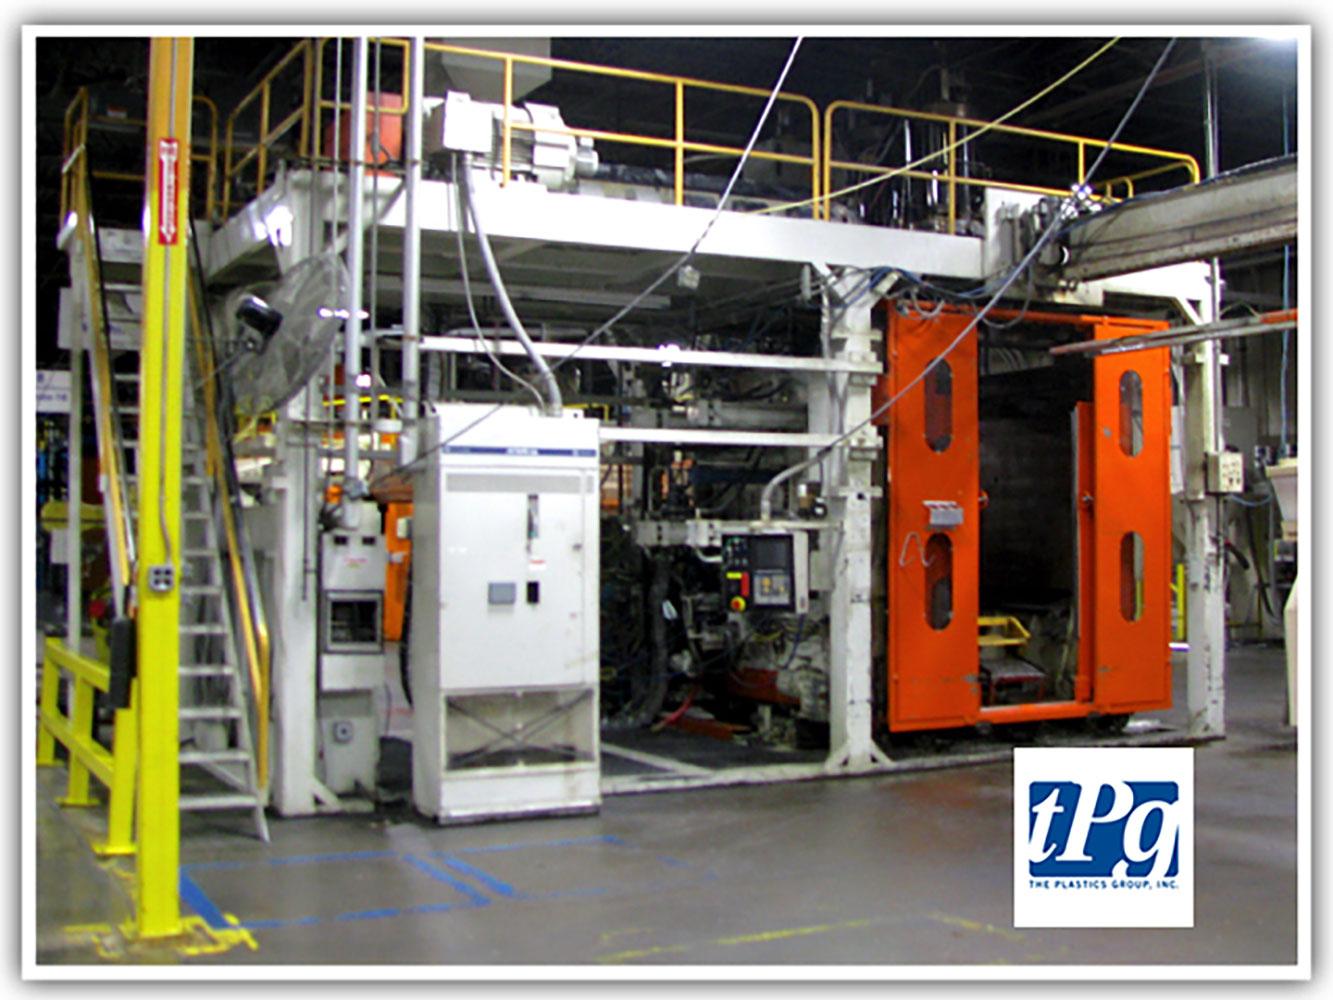 TPG: Fremont Plant Auctions Large Capacity Blow Molding Equipment